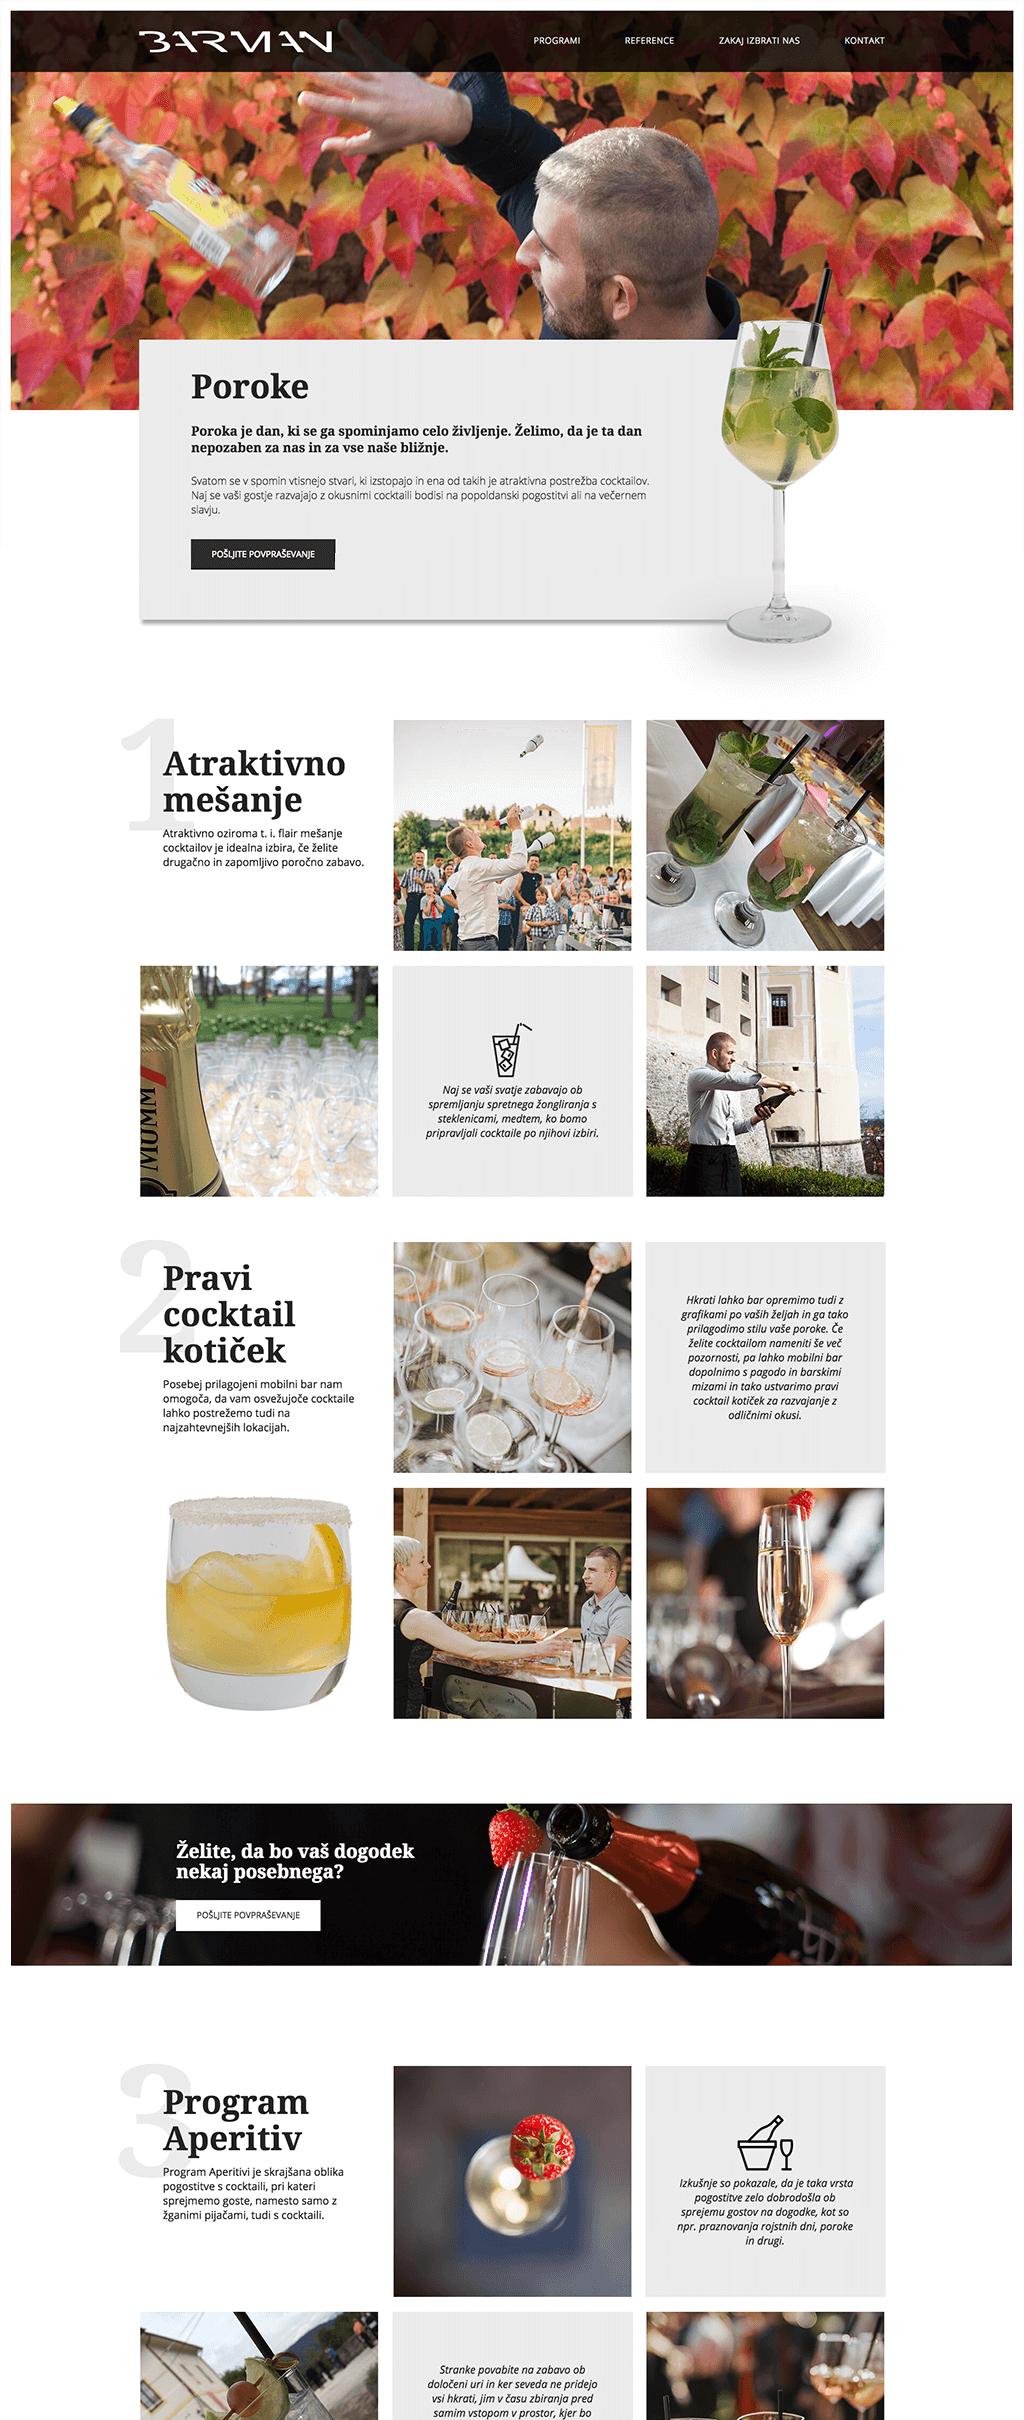 barman_programi